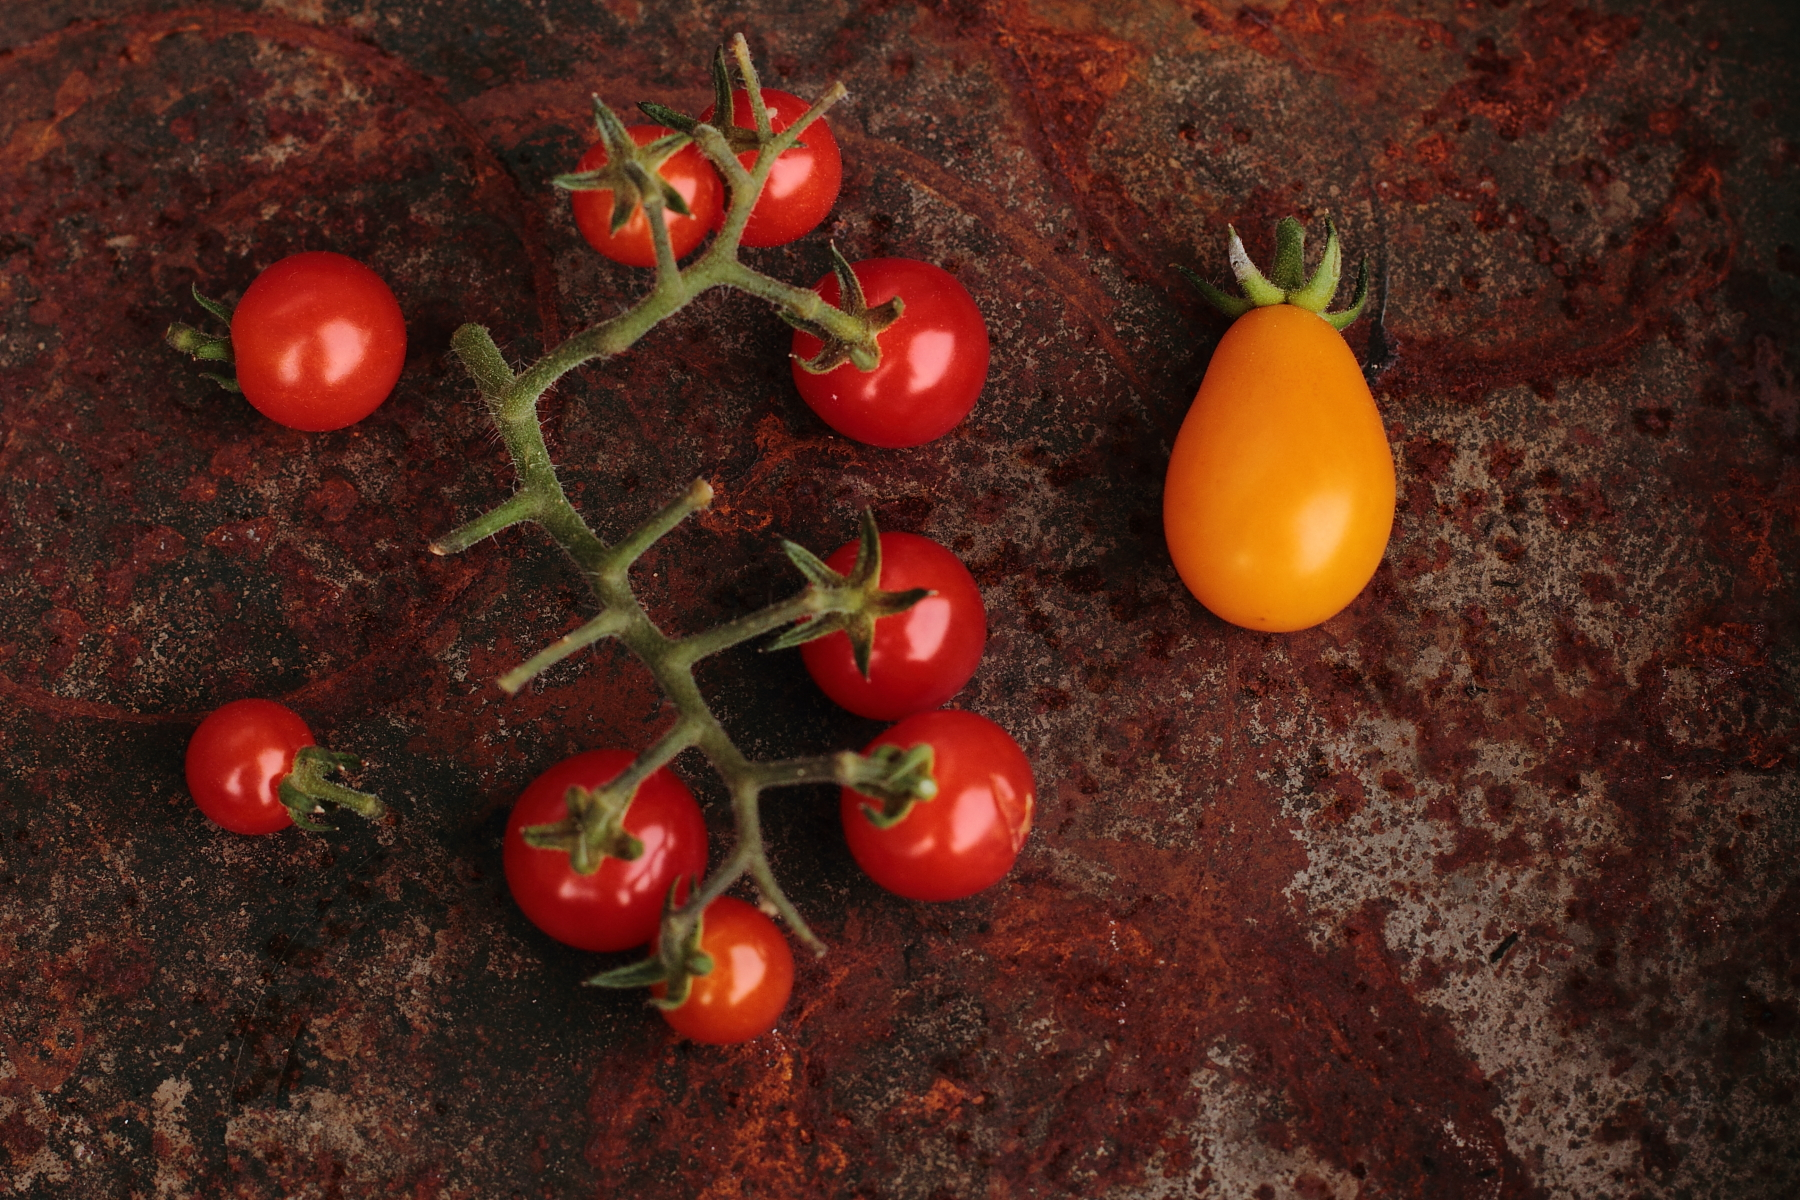 Tomatoes_IMG_5341©2012_HelenaMcMurdo